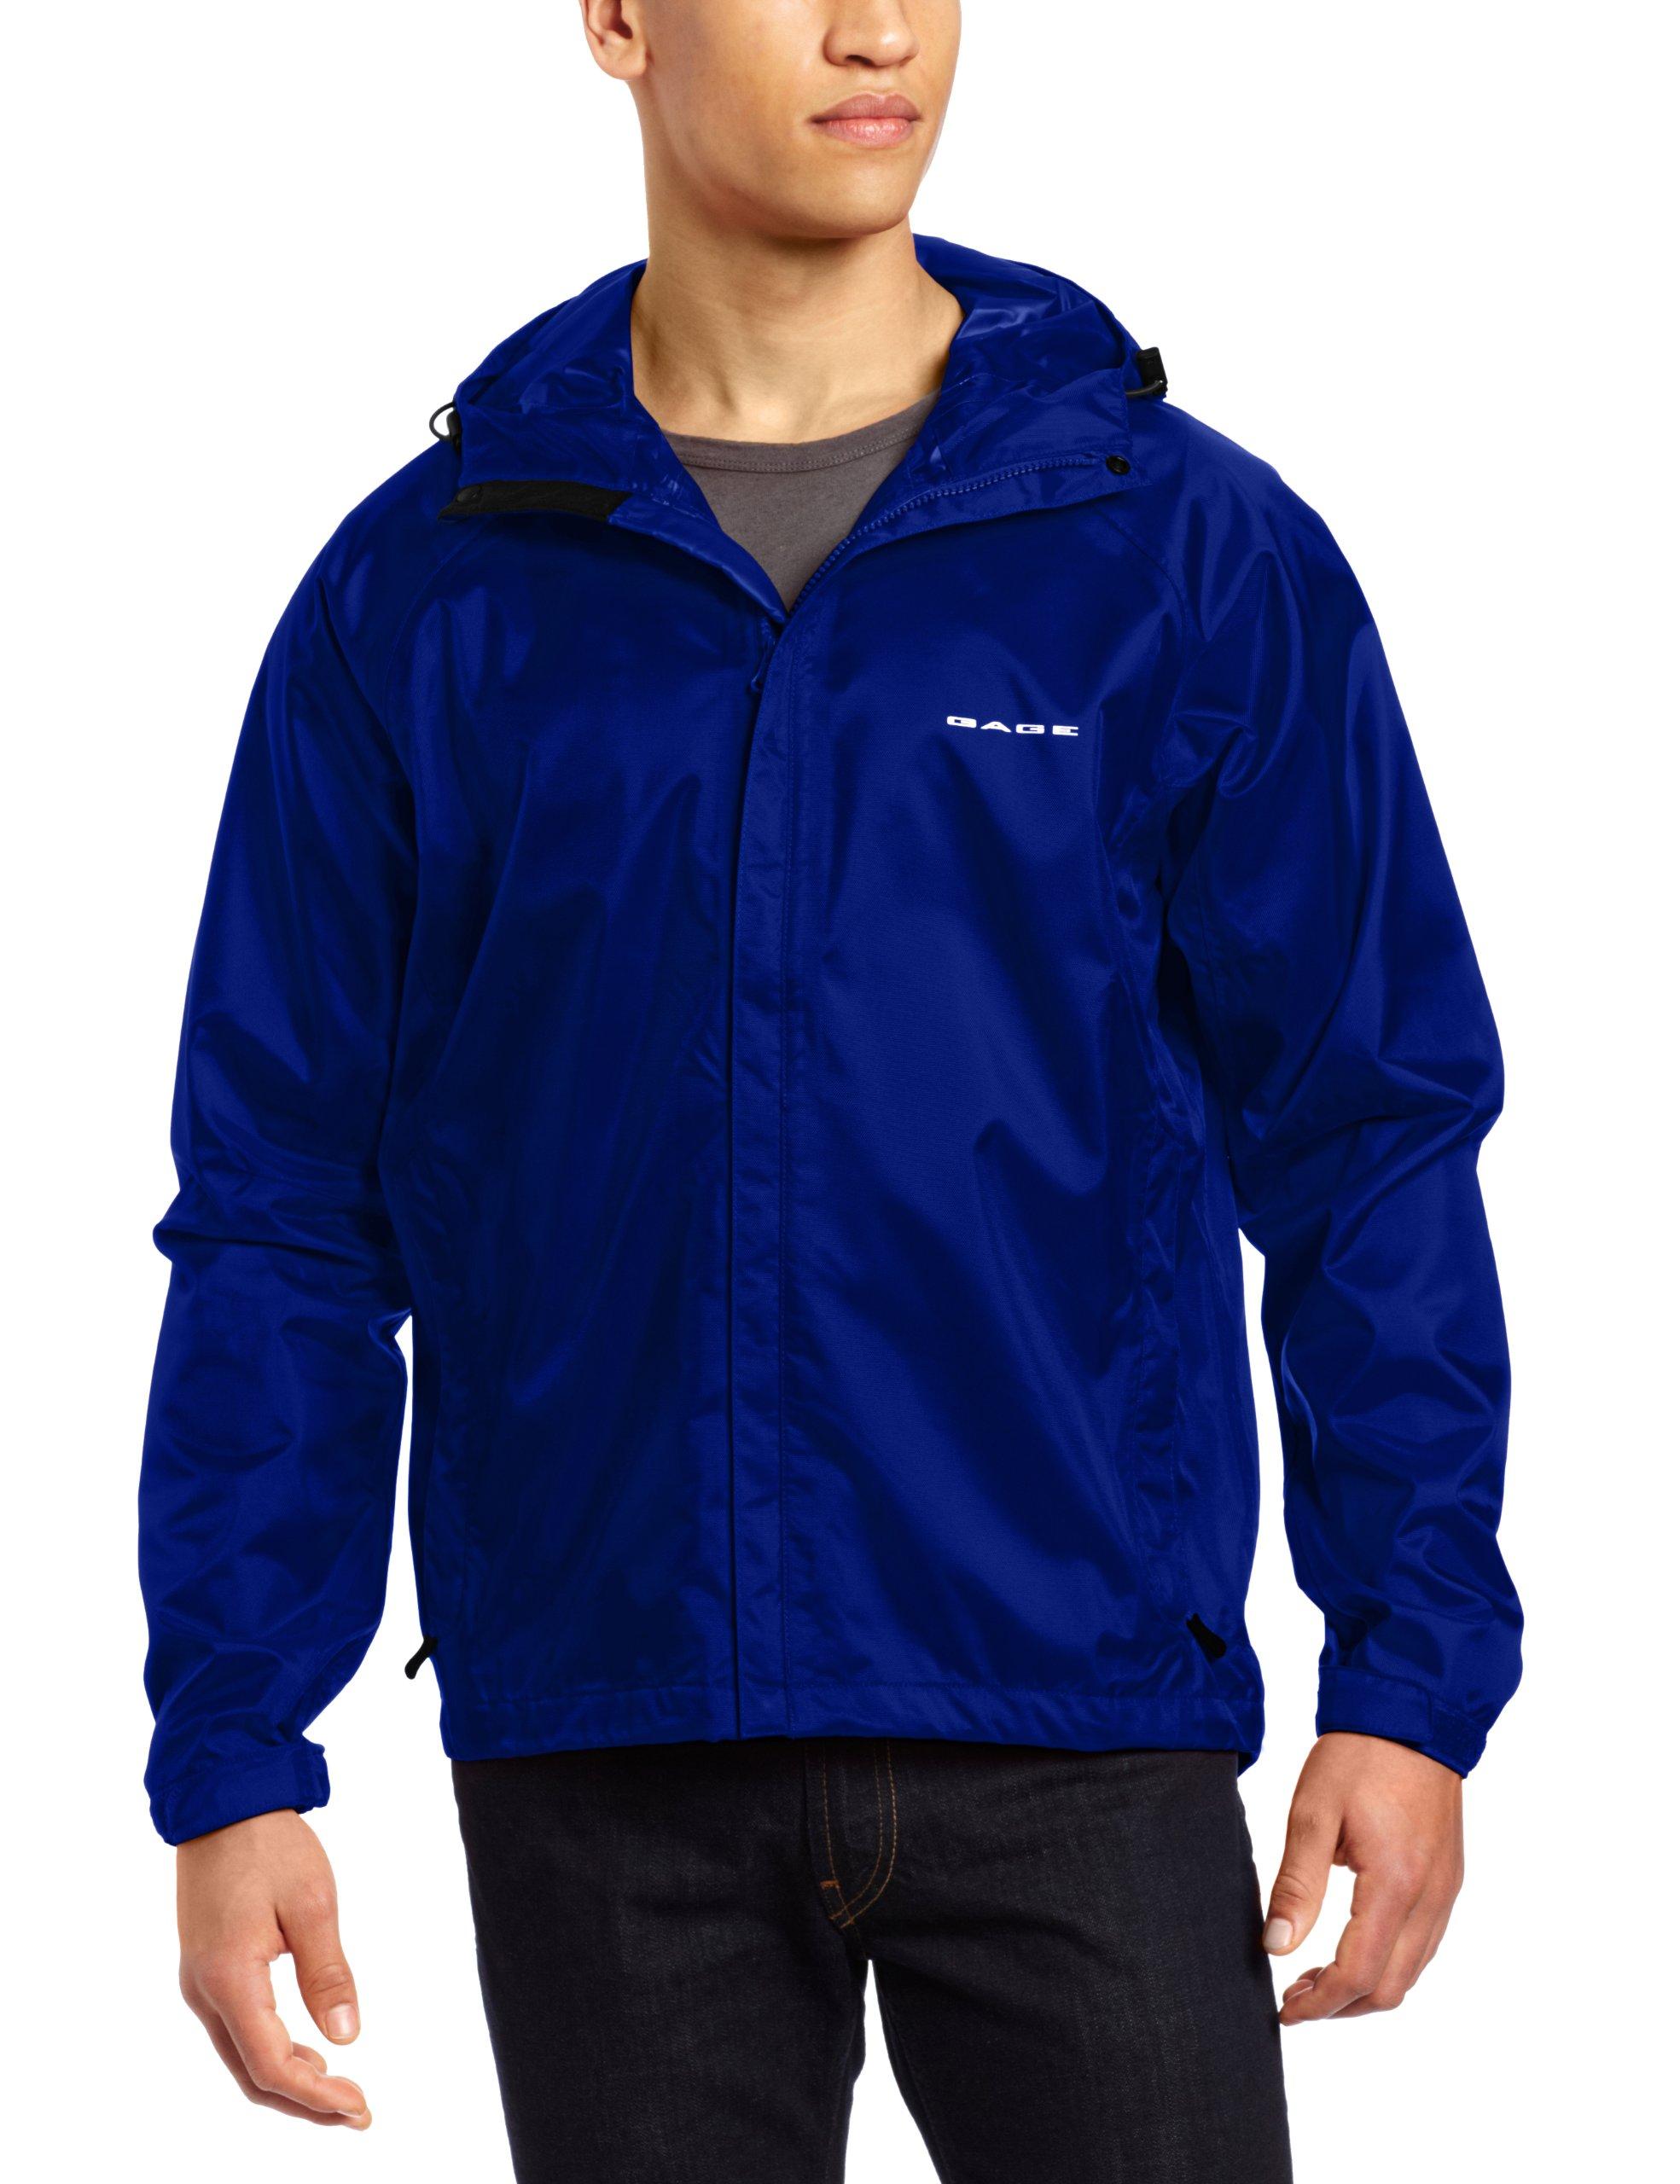 Grundens Gage Weather Watch Jacket - Navy Blue - XL by Grundéns